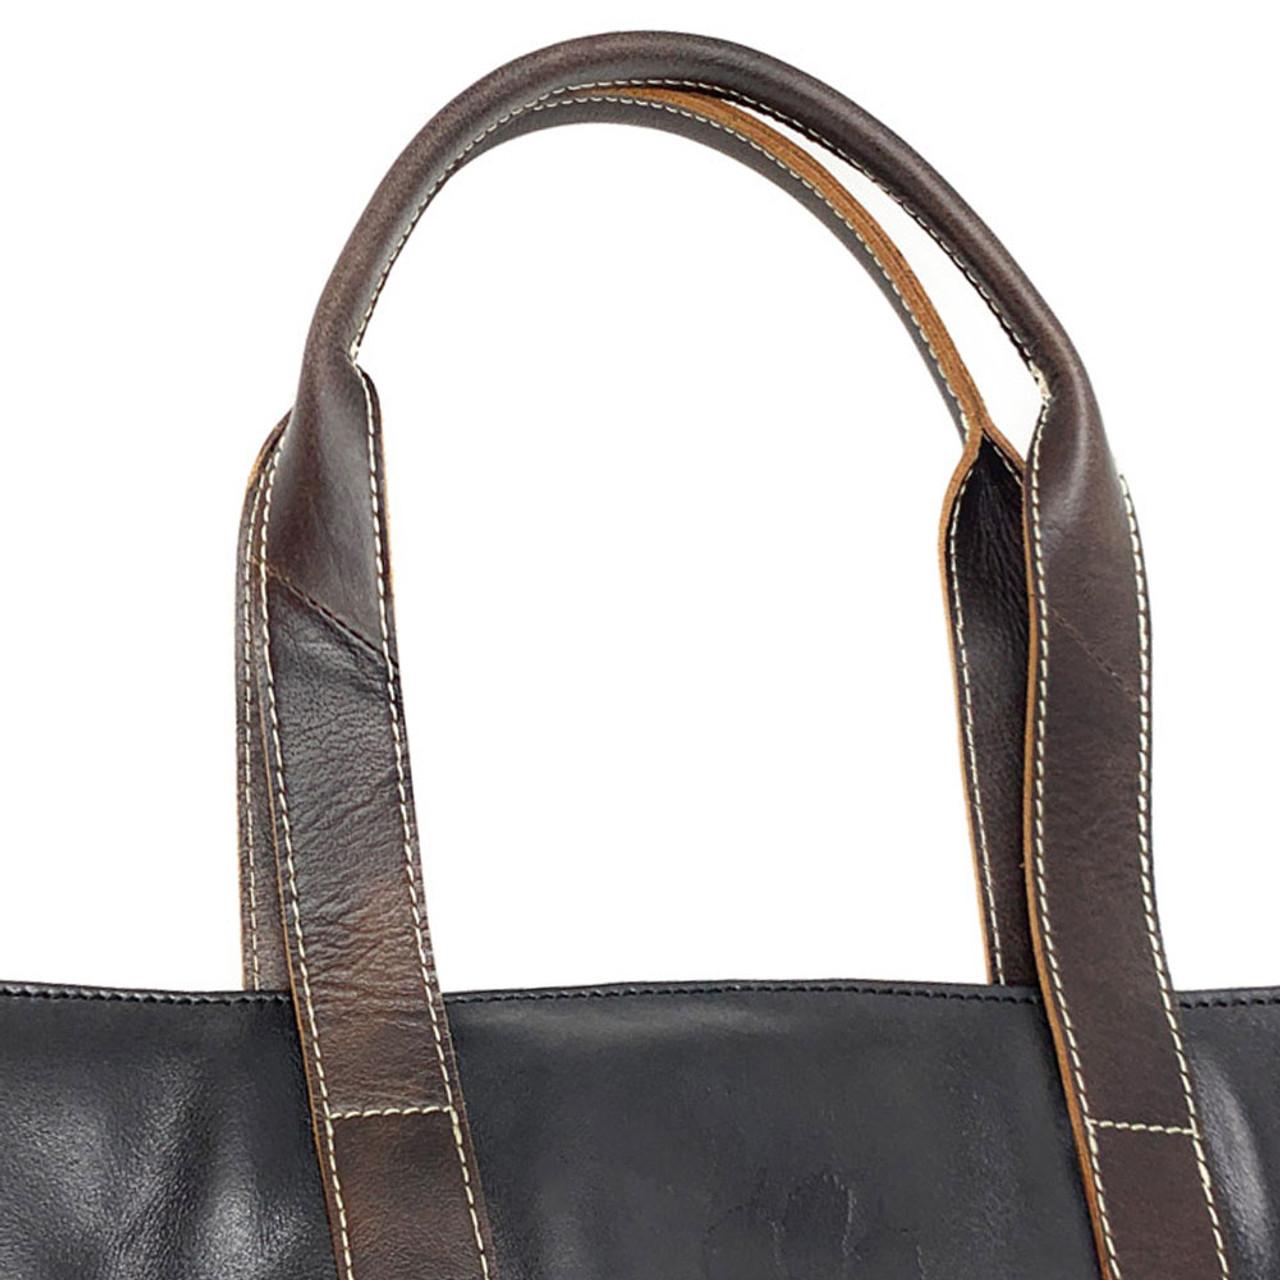 University of Oklahoma Sooners Tote Bag Black Genuine Leather Tote